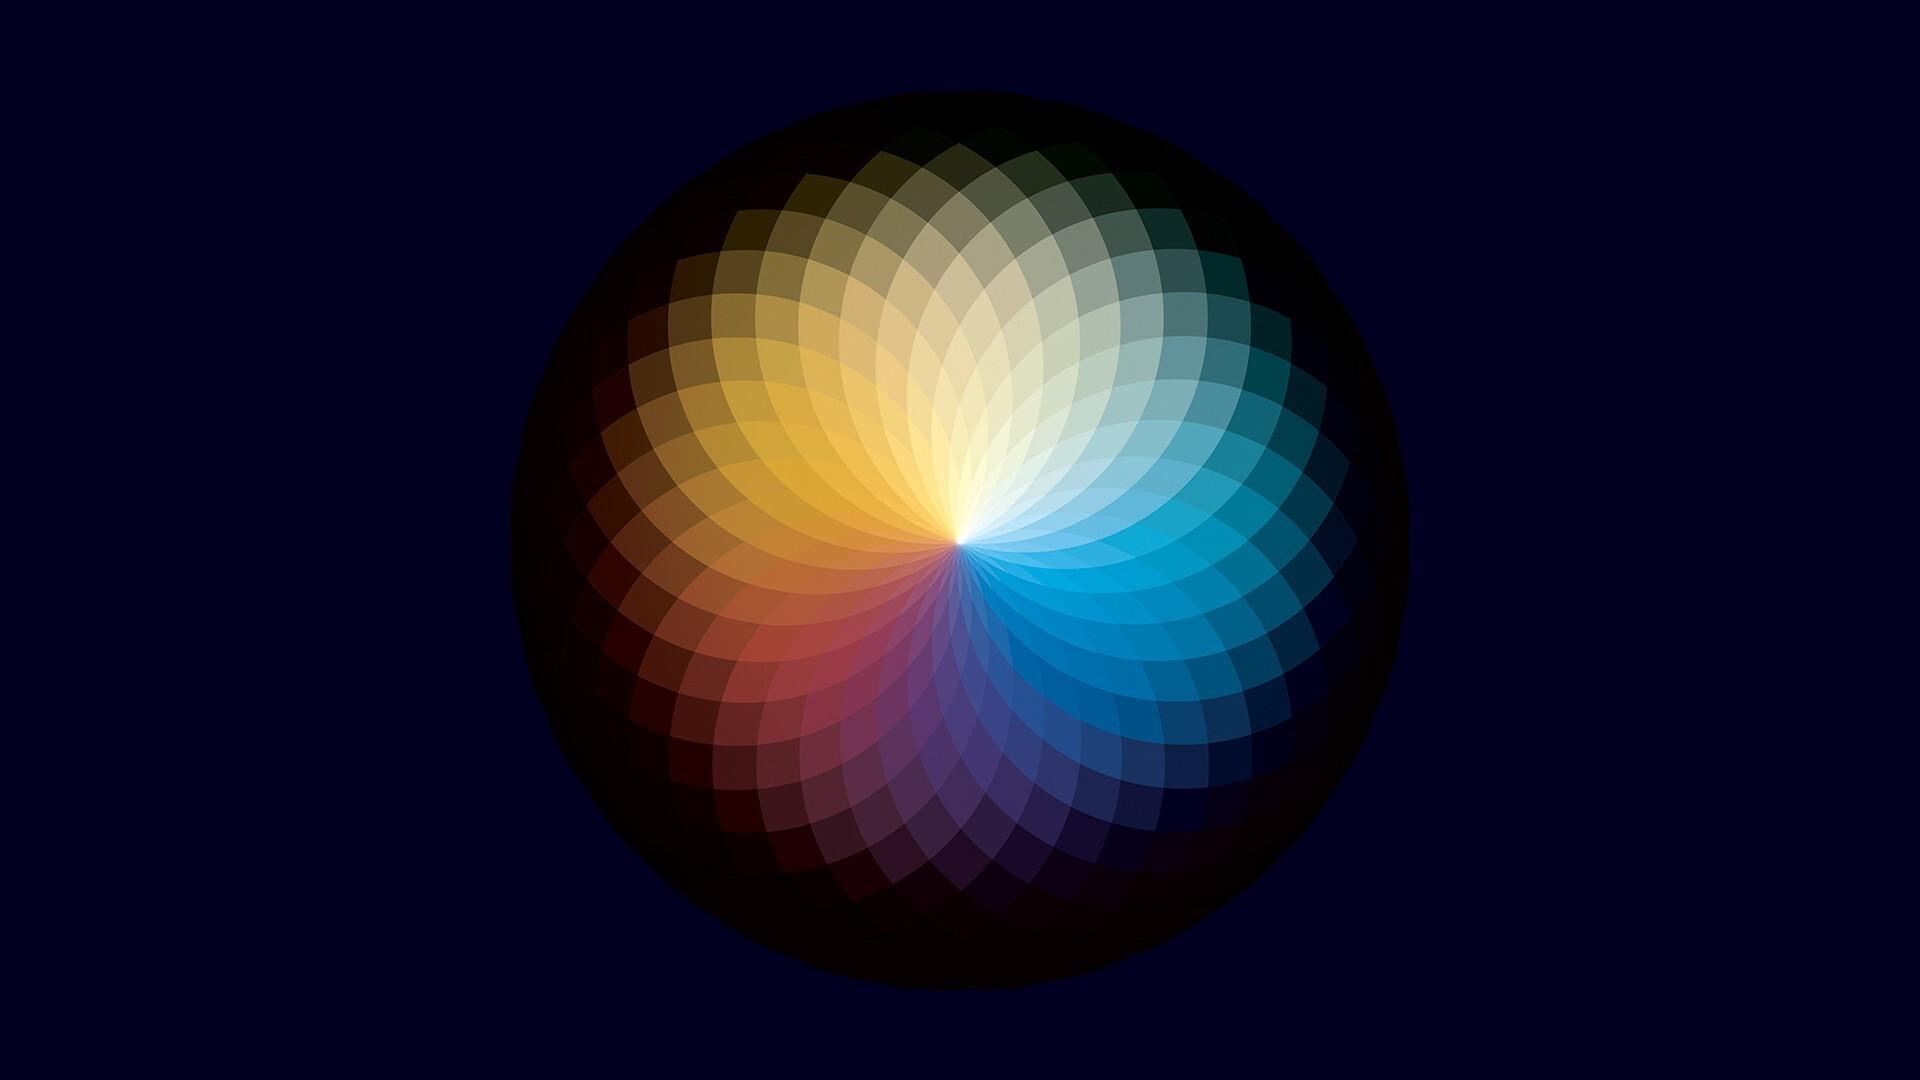 Color Wheel Laptop Full HD 1080P HD 4k Wallpapers